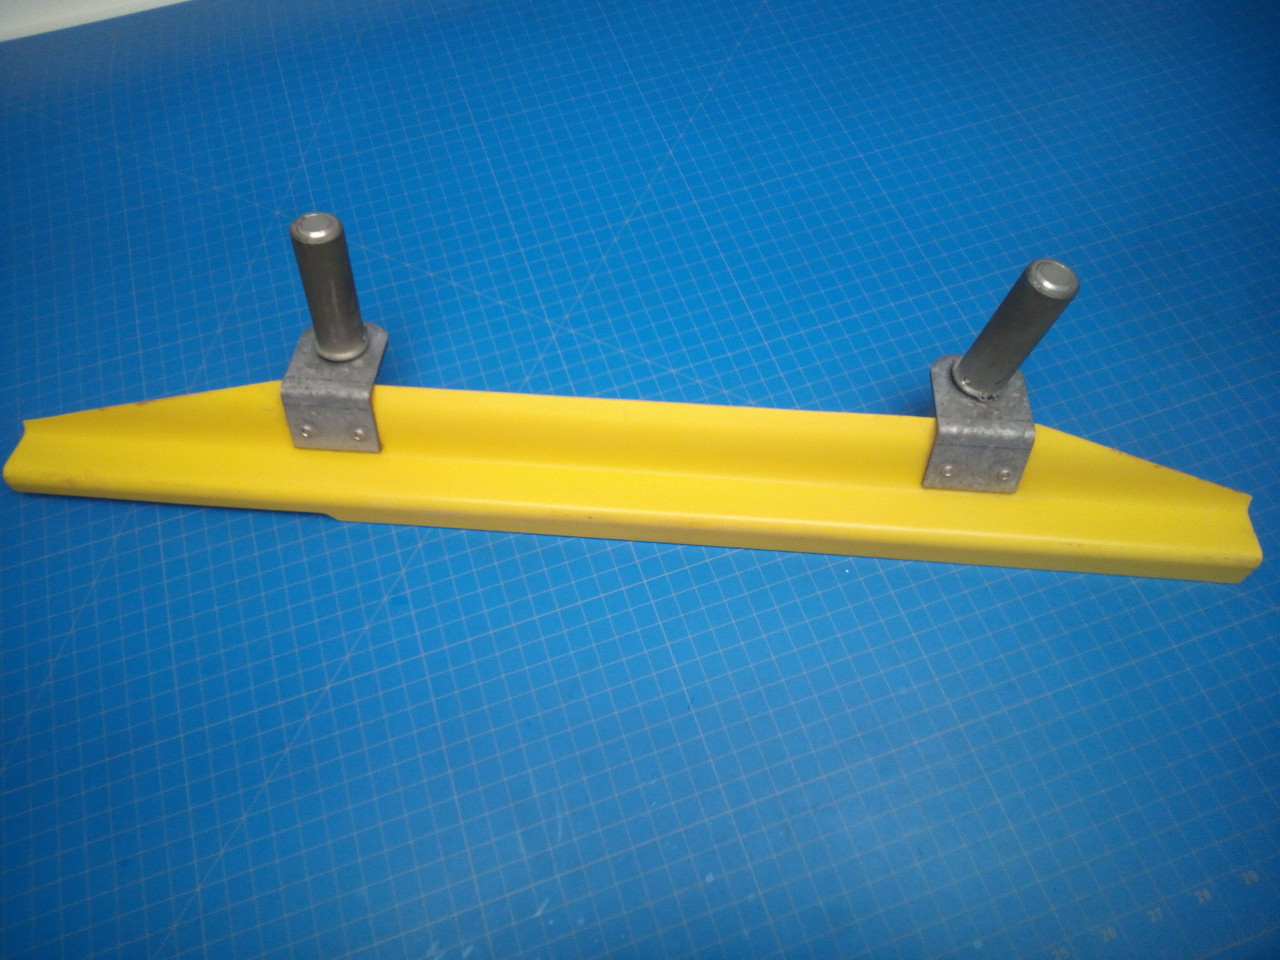 Polar Knife Changing Tool ZA3.036170 - P01-000042